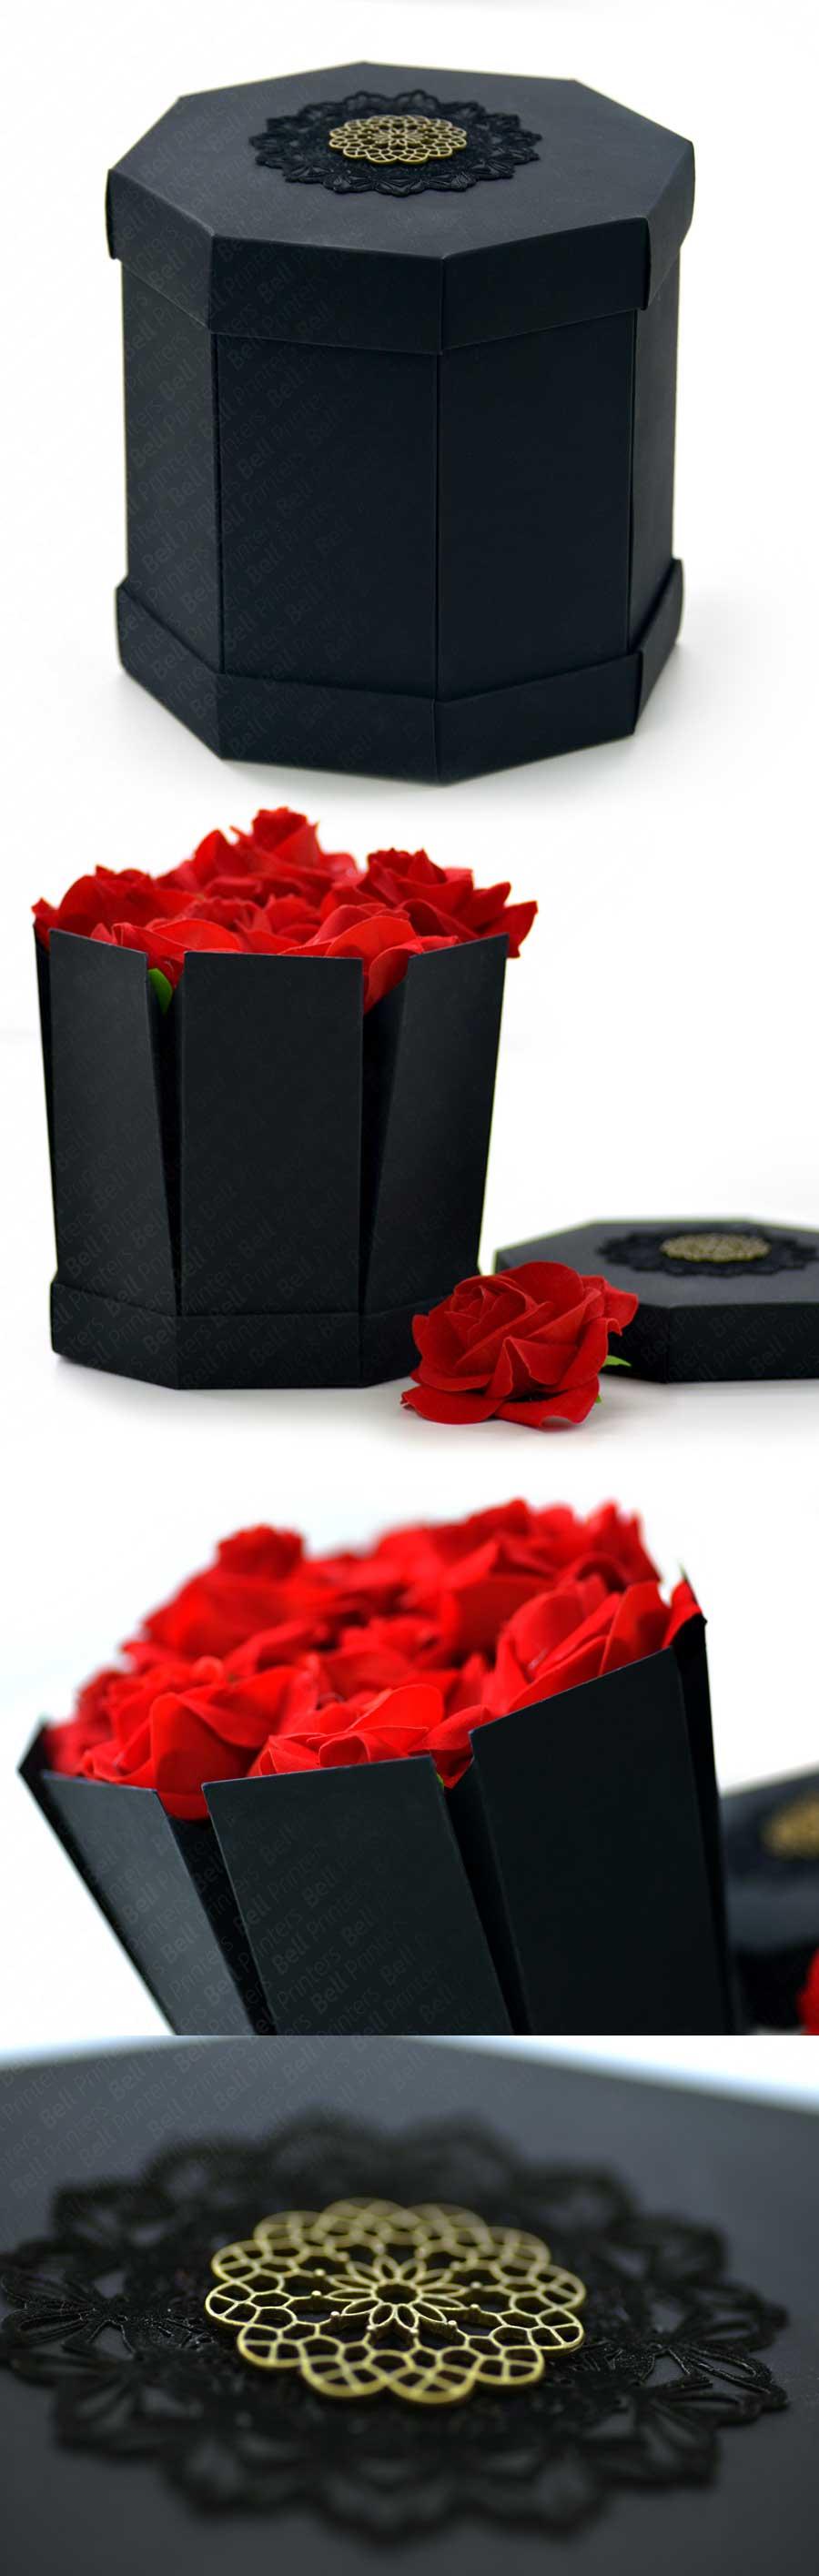 flower packaging boxes | flower packaging boxes wholesale